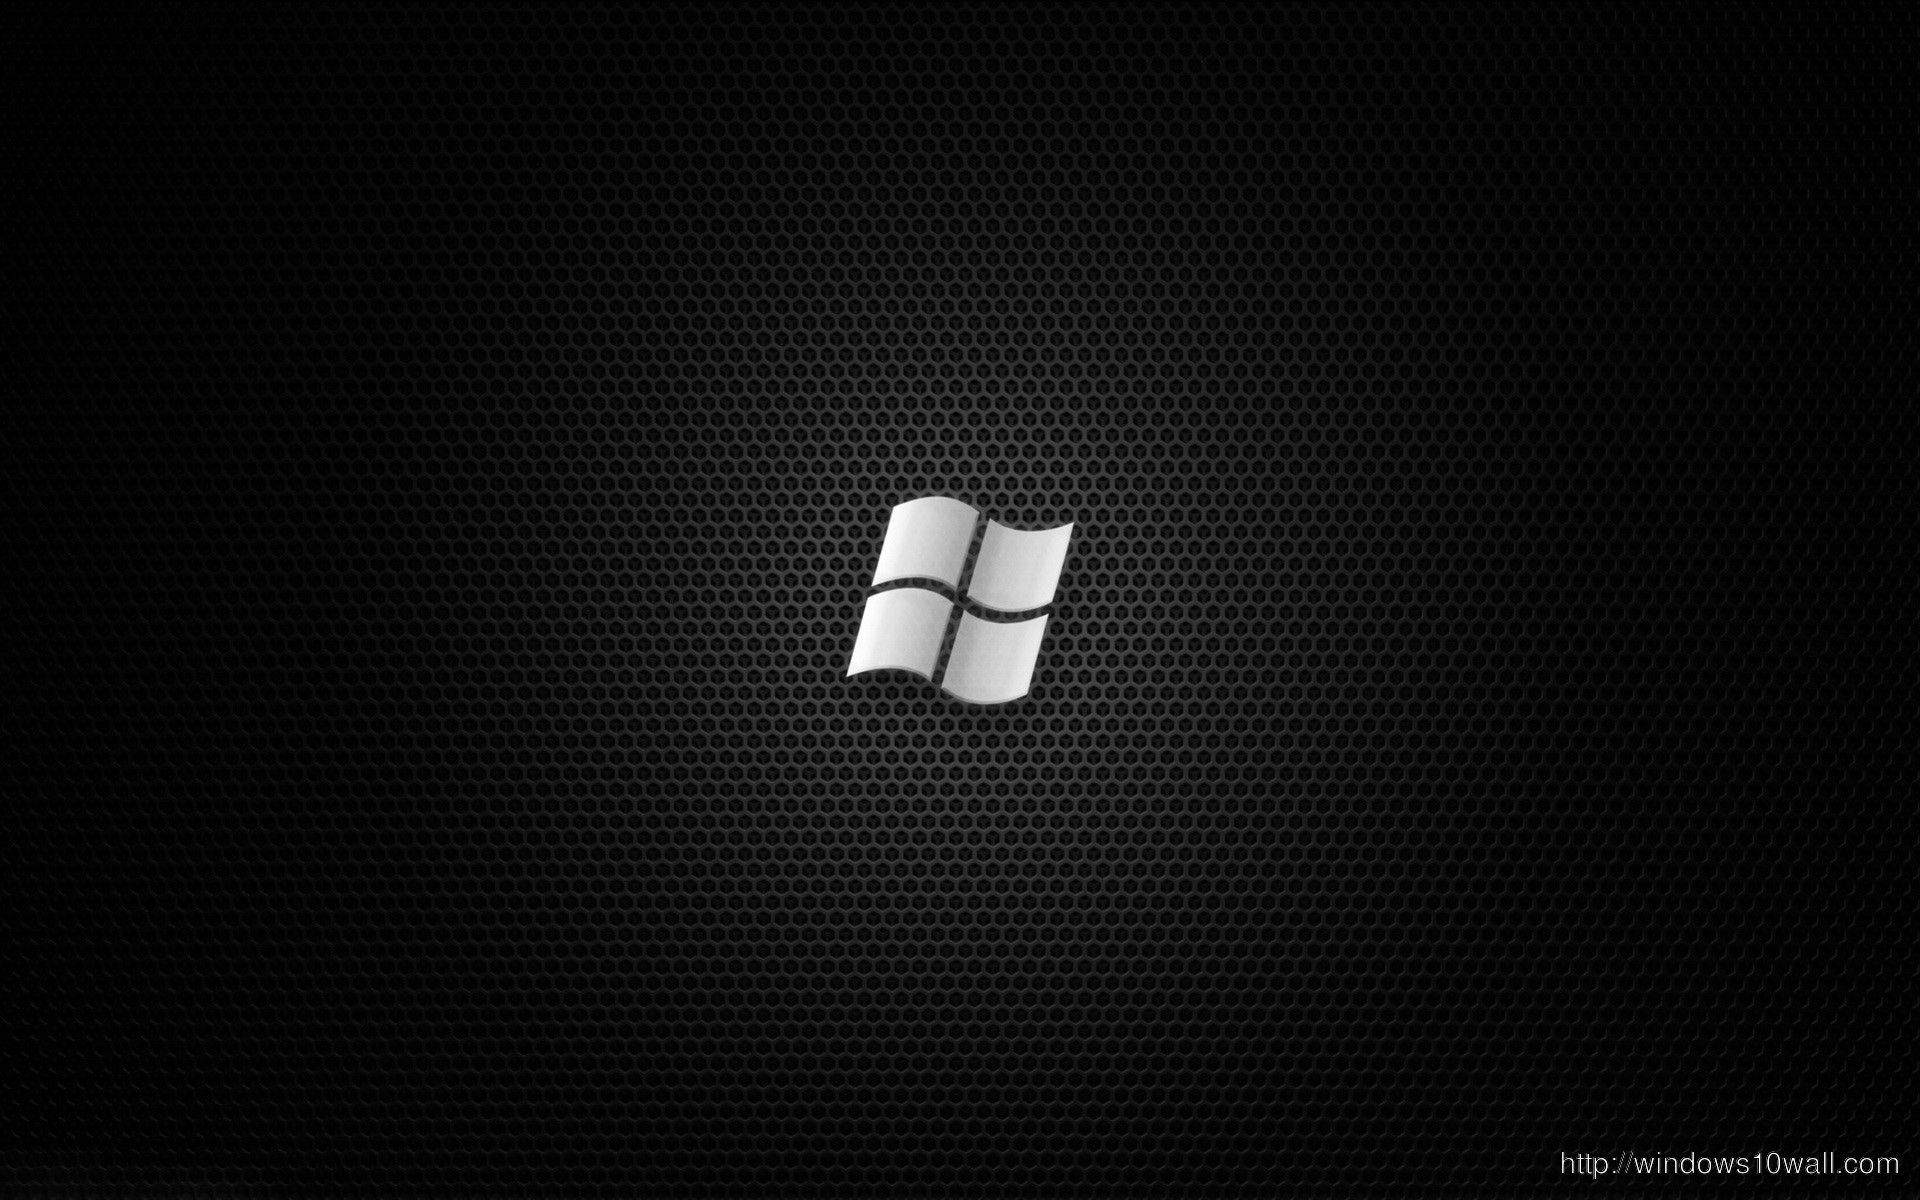 Hd Black And White For Windows Desktop HD Wallpaper 1920x1200